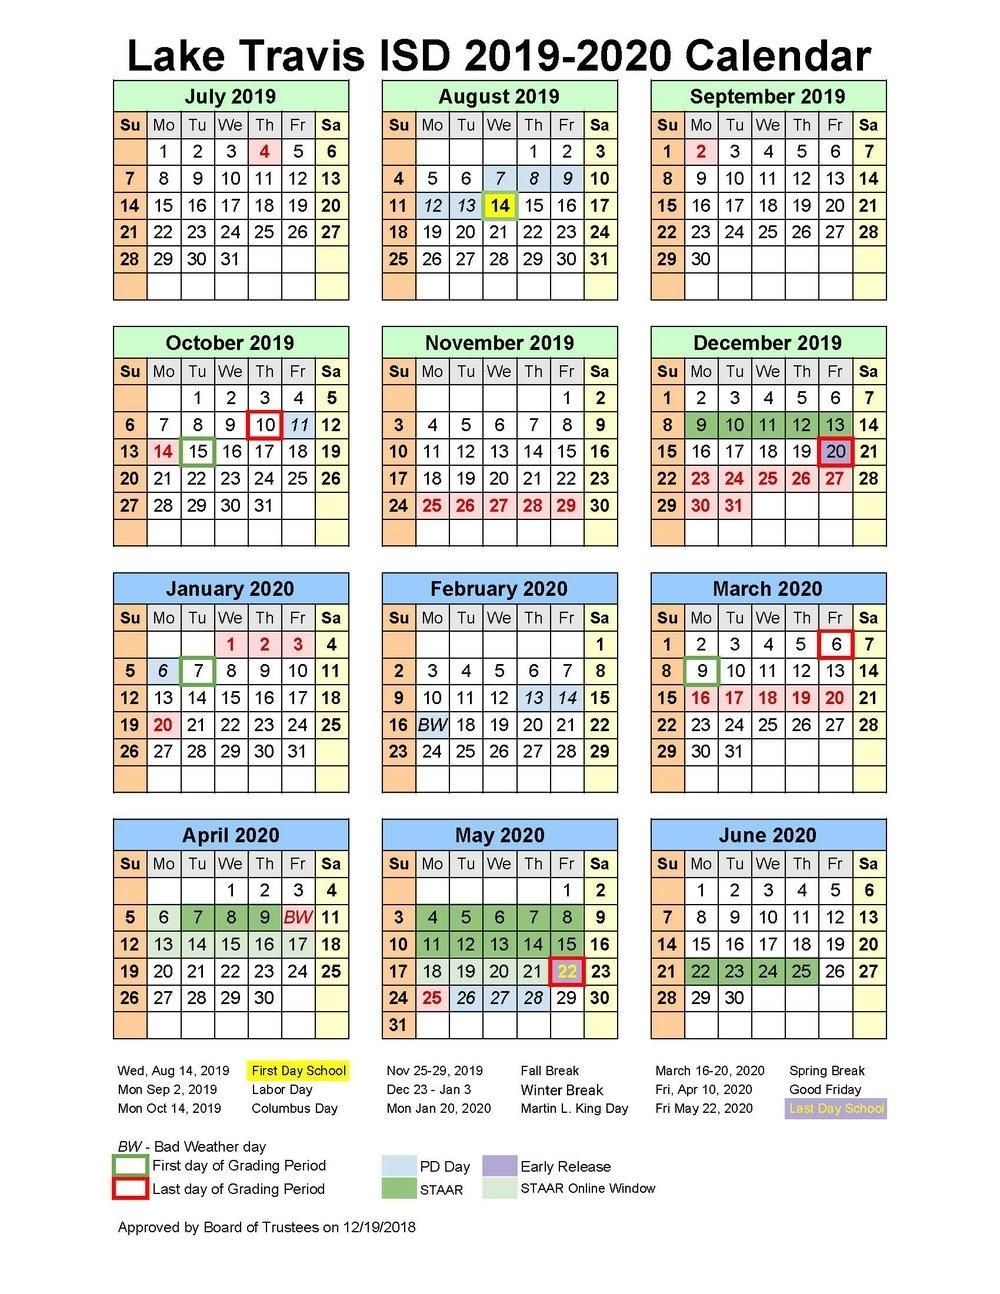 School Board Approves 2019-2020 Instructional Calendar